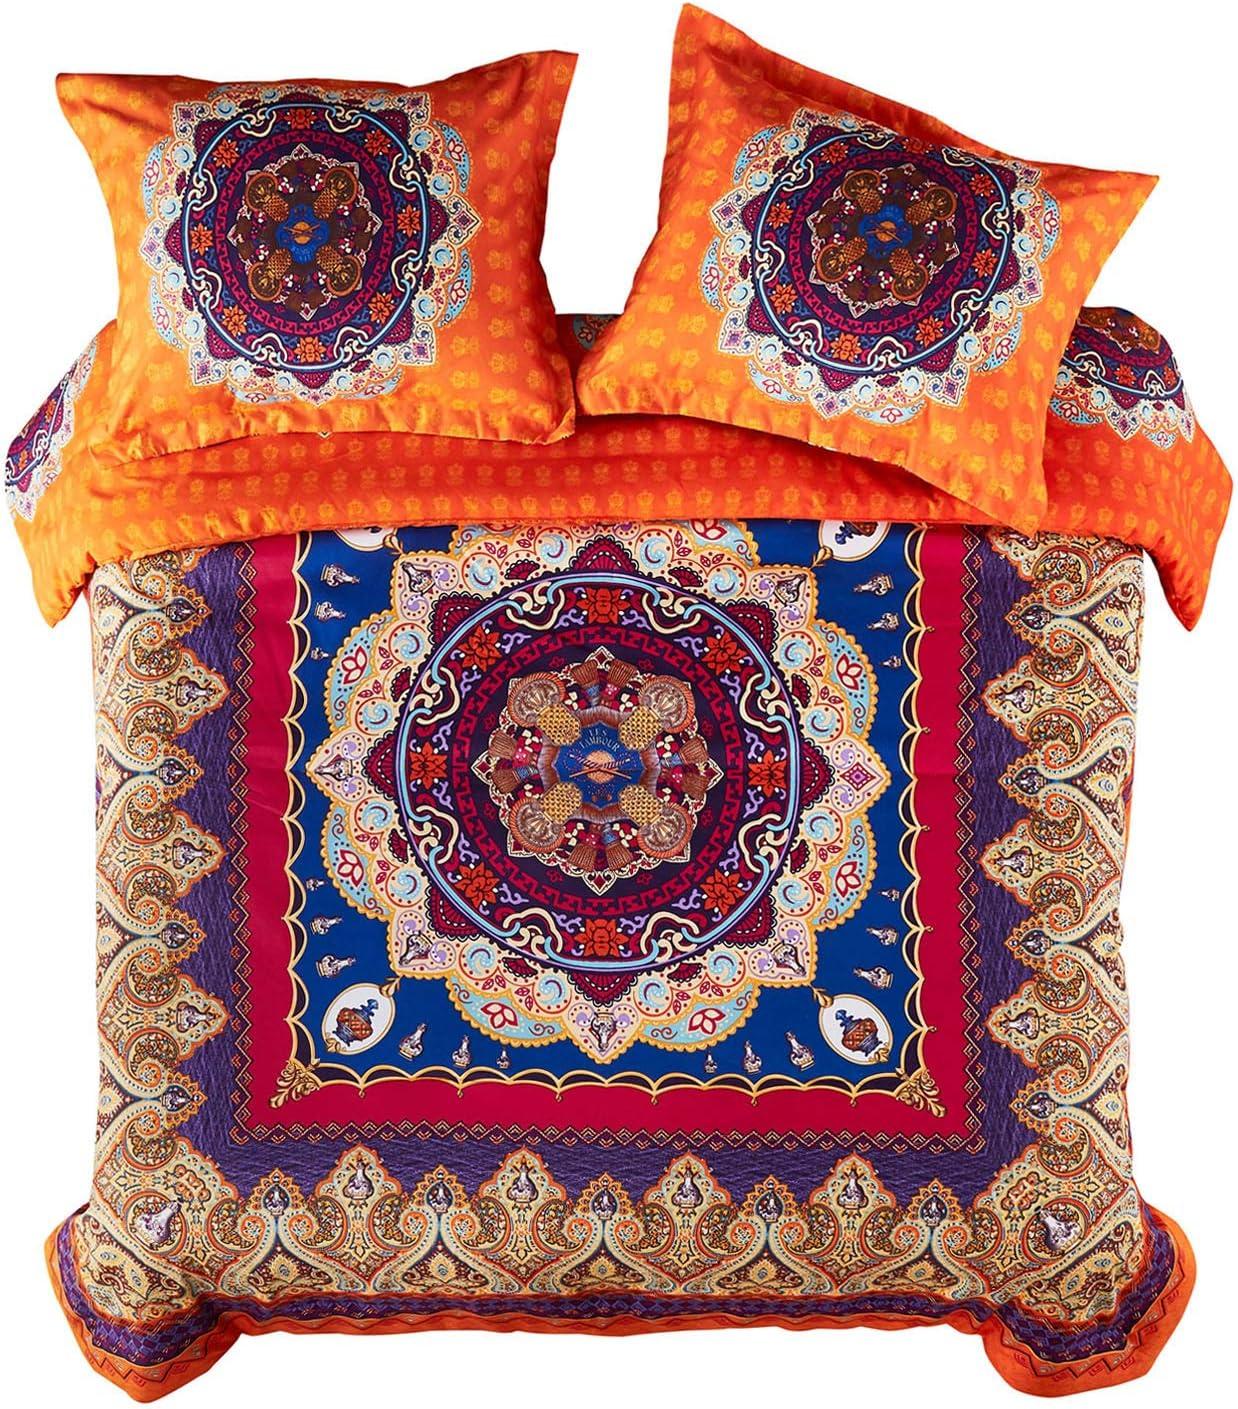 Wake In Cloud - Mandala Duvet Cover Set, Orange Bohemian Boho Chic Medallion Printed Soft Microfiber Bedding, with Zipper Closure (3pcs, Full Size)